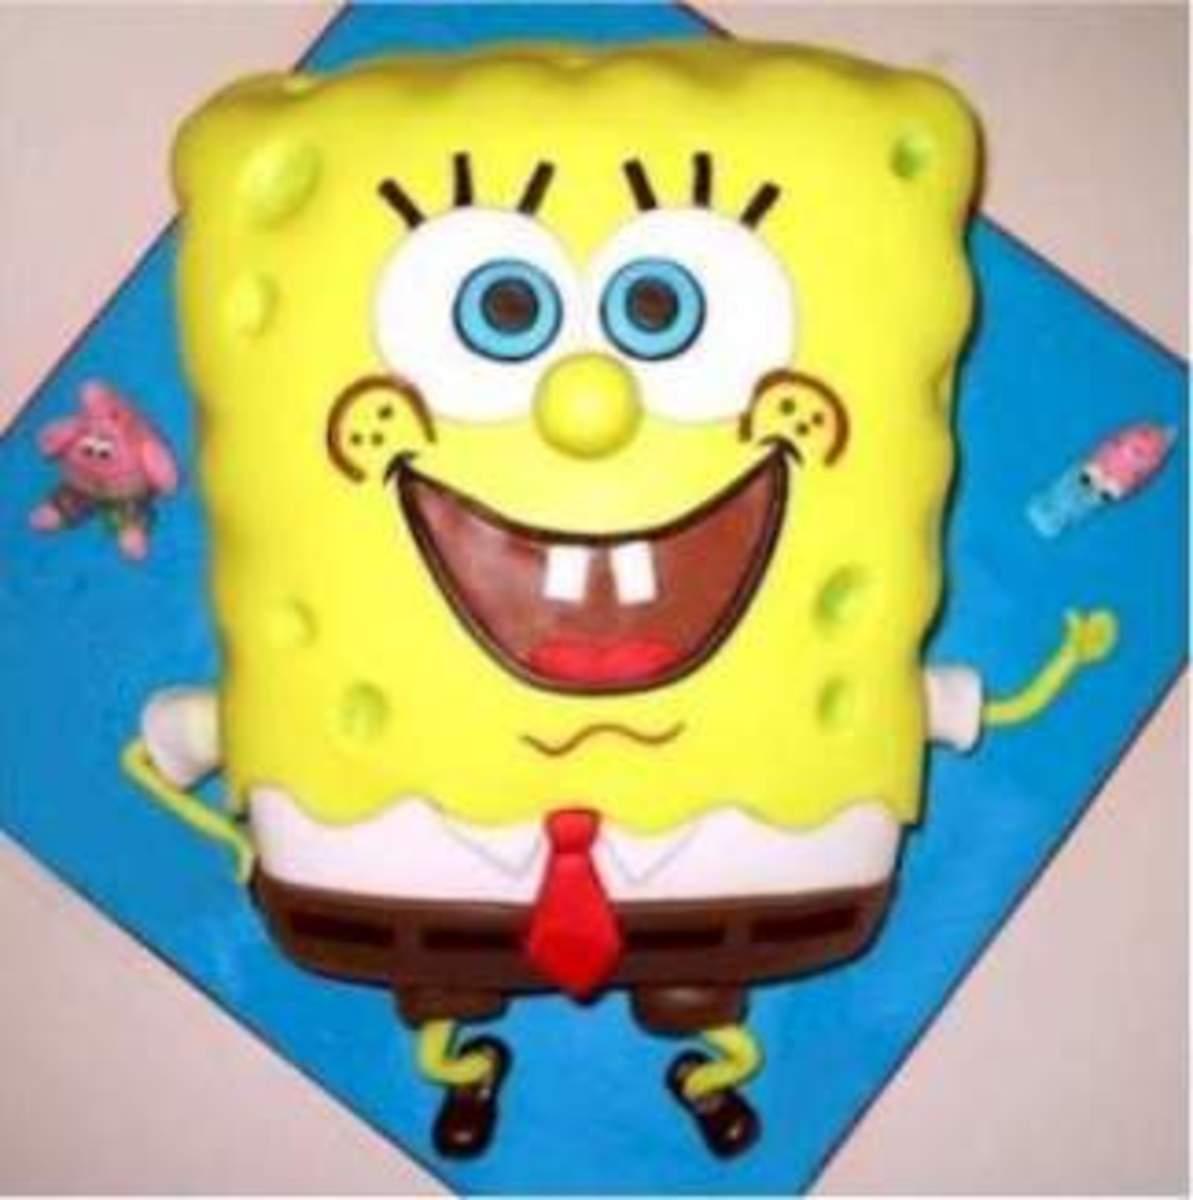 How to make a Spongebob squarepants cake A firm favourite for any